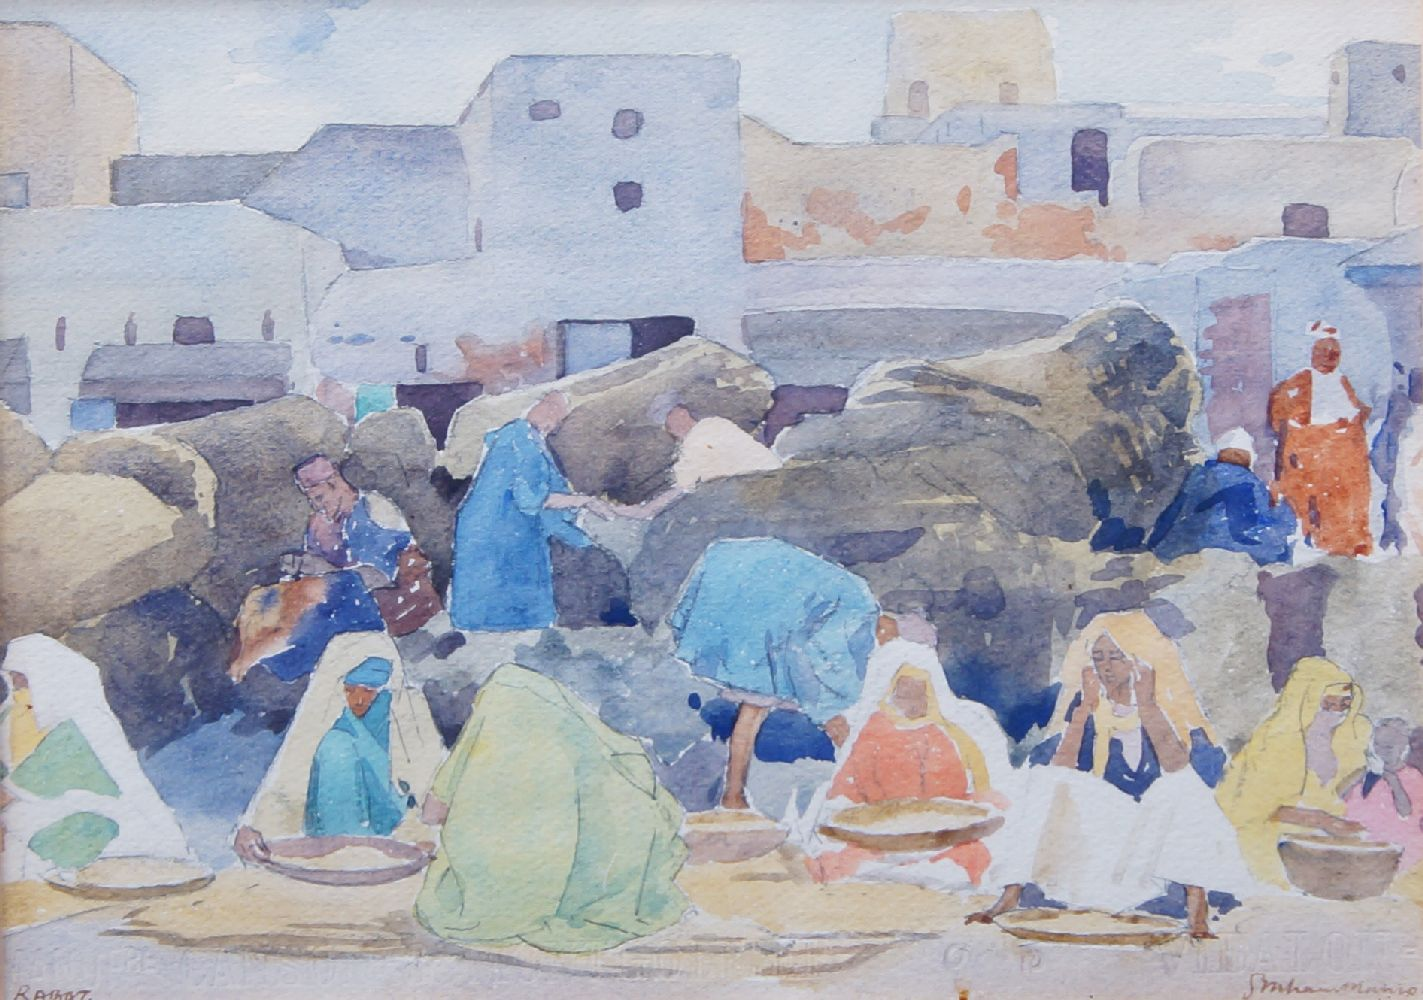 Alexander Graham Munro RSW, Scottish 1903-1985- Rabat, 1927; watercolour and pencil, signed and